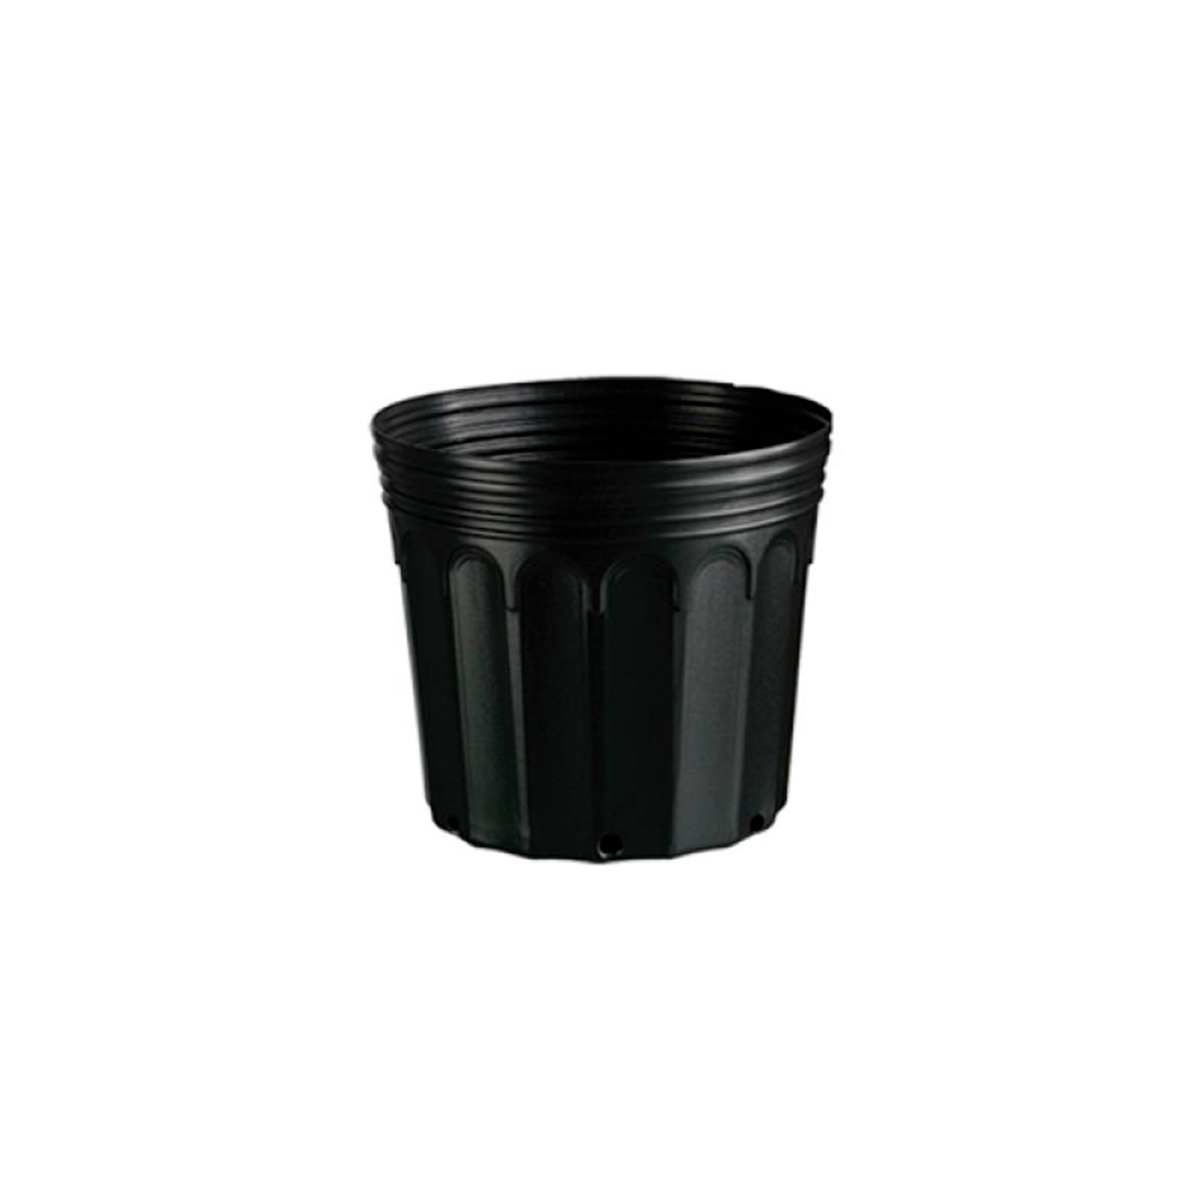 Kit 45 Embalagem Vaso para Mudas Plástico 3,6L